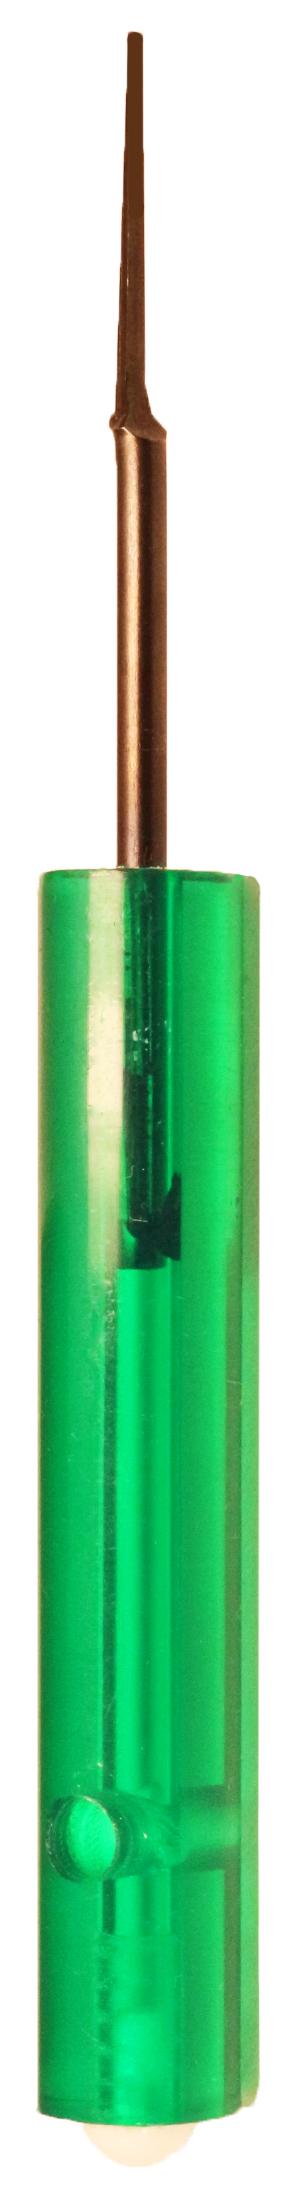 tool-mp-12094429-green-vert.jpg